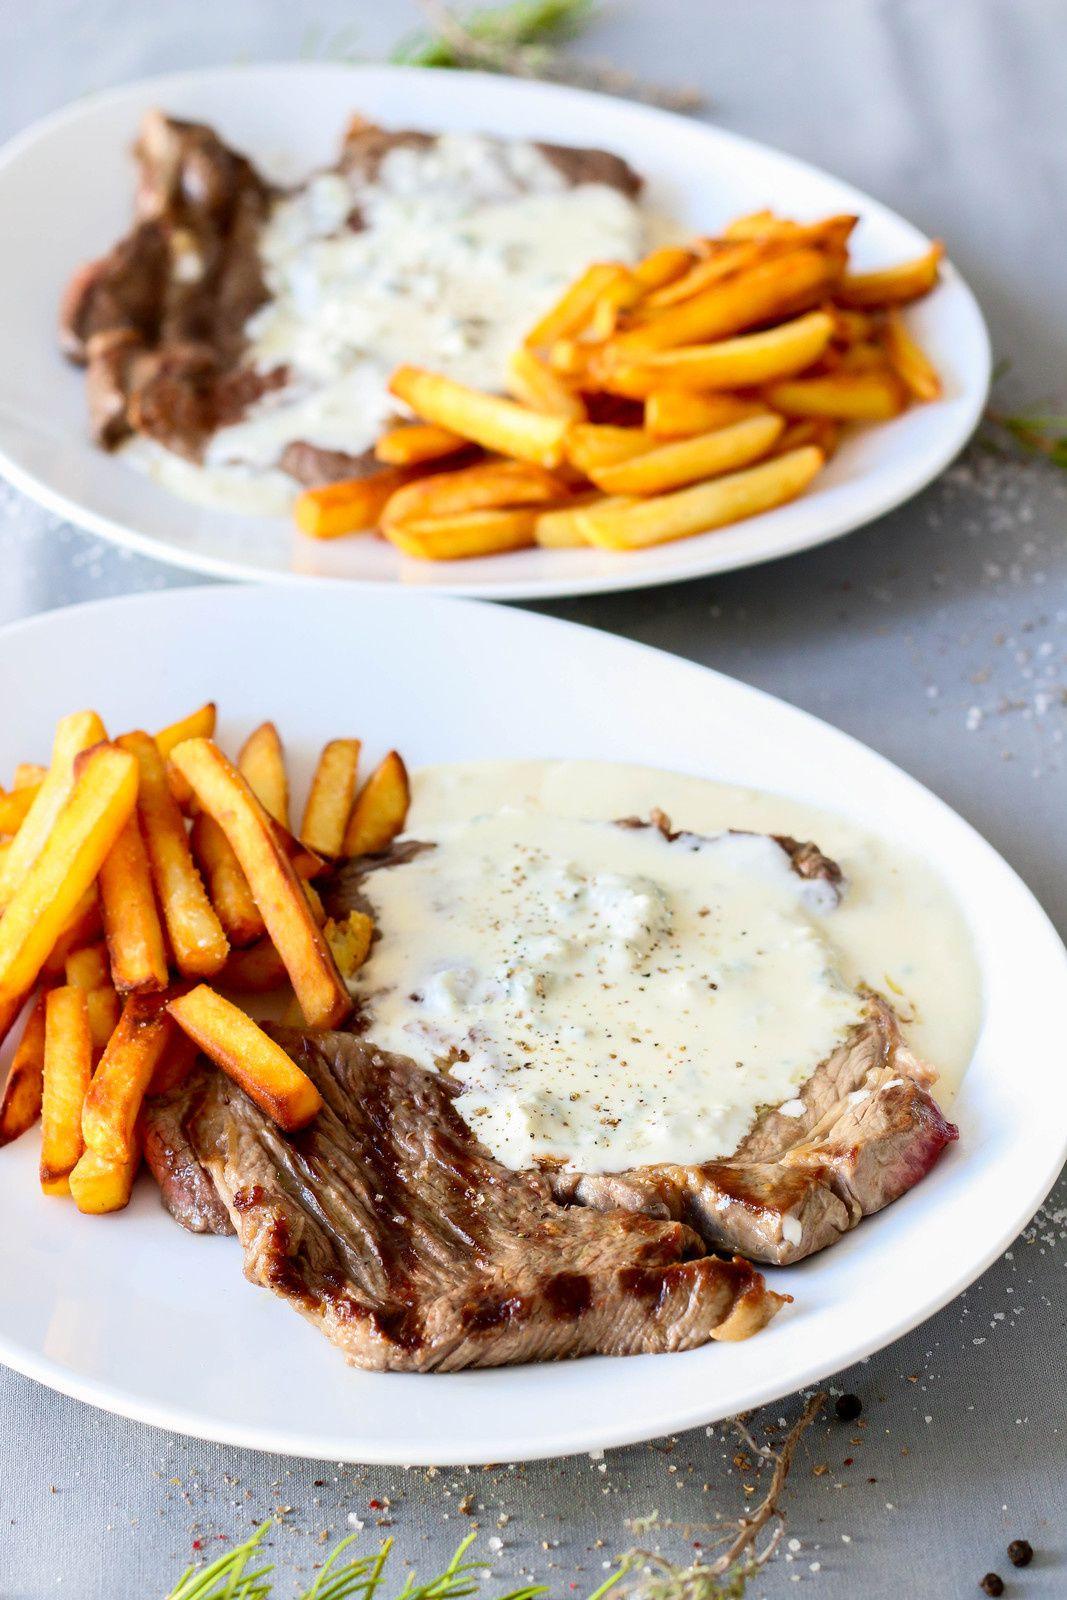 Basse côte grillée, sauce au gorgonzola